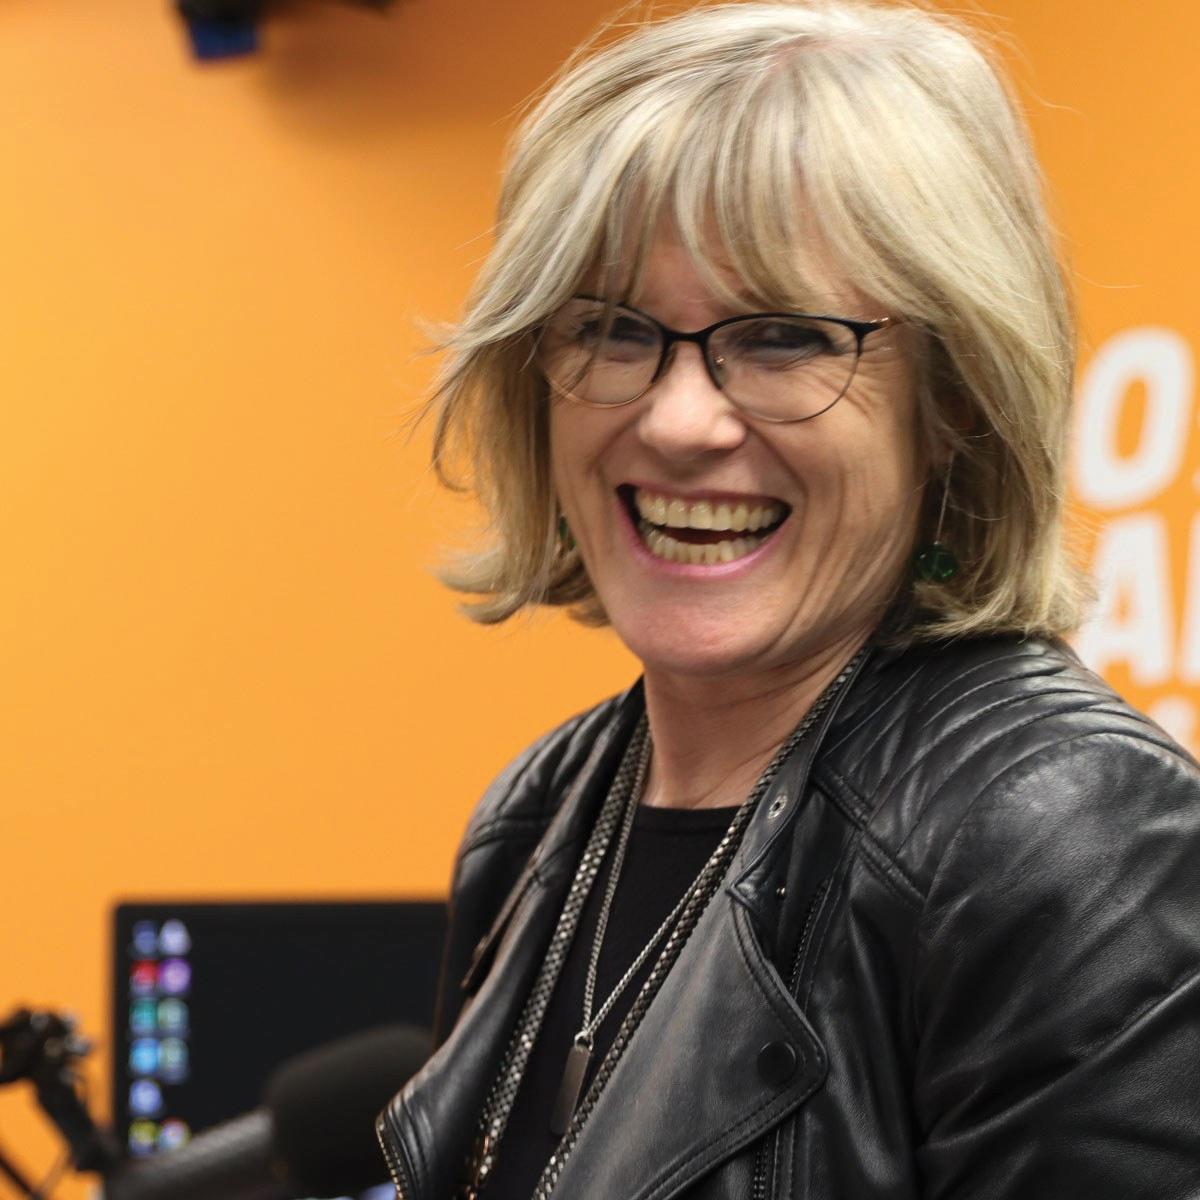 Adelaide living podcast dr christina hagger 2